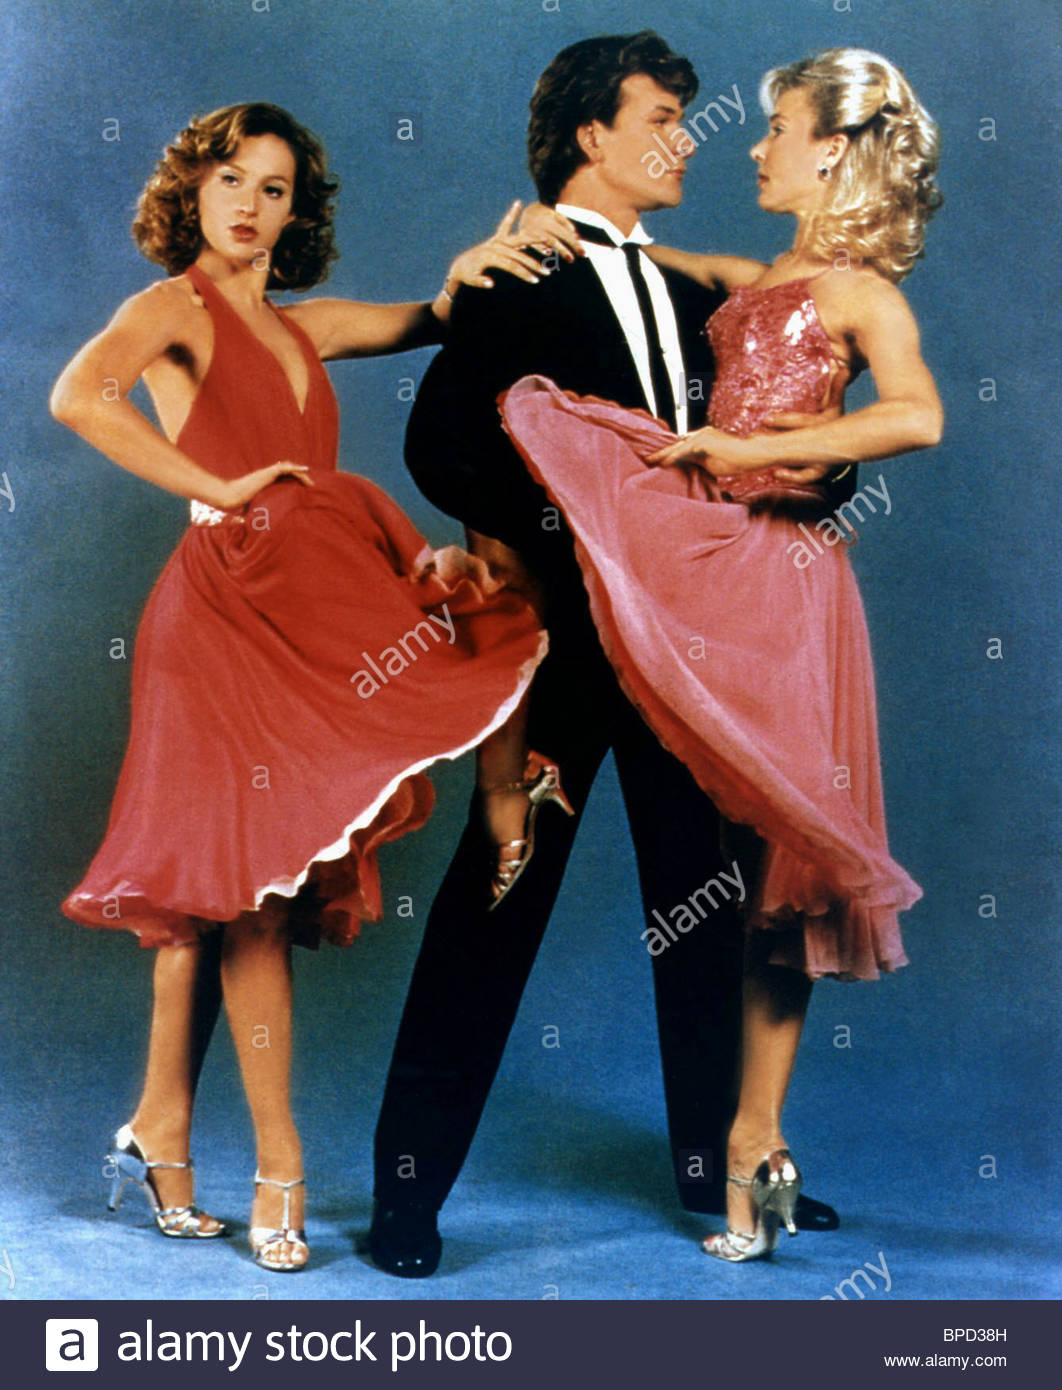 Jennifer Grey Patrick Swayze Cynthia Rhodes Dirty Dancing 1987